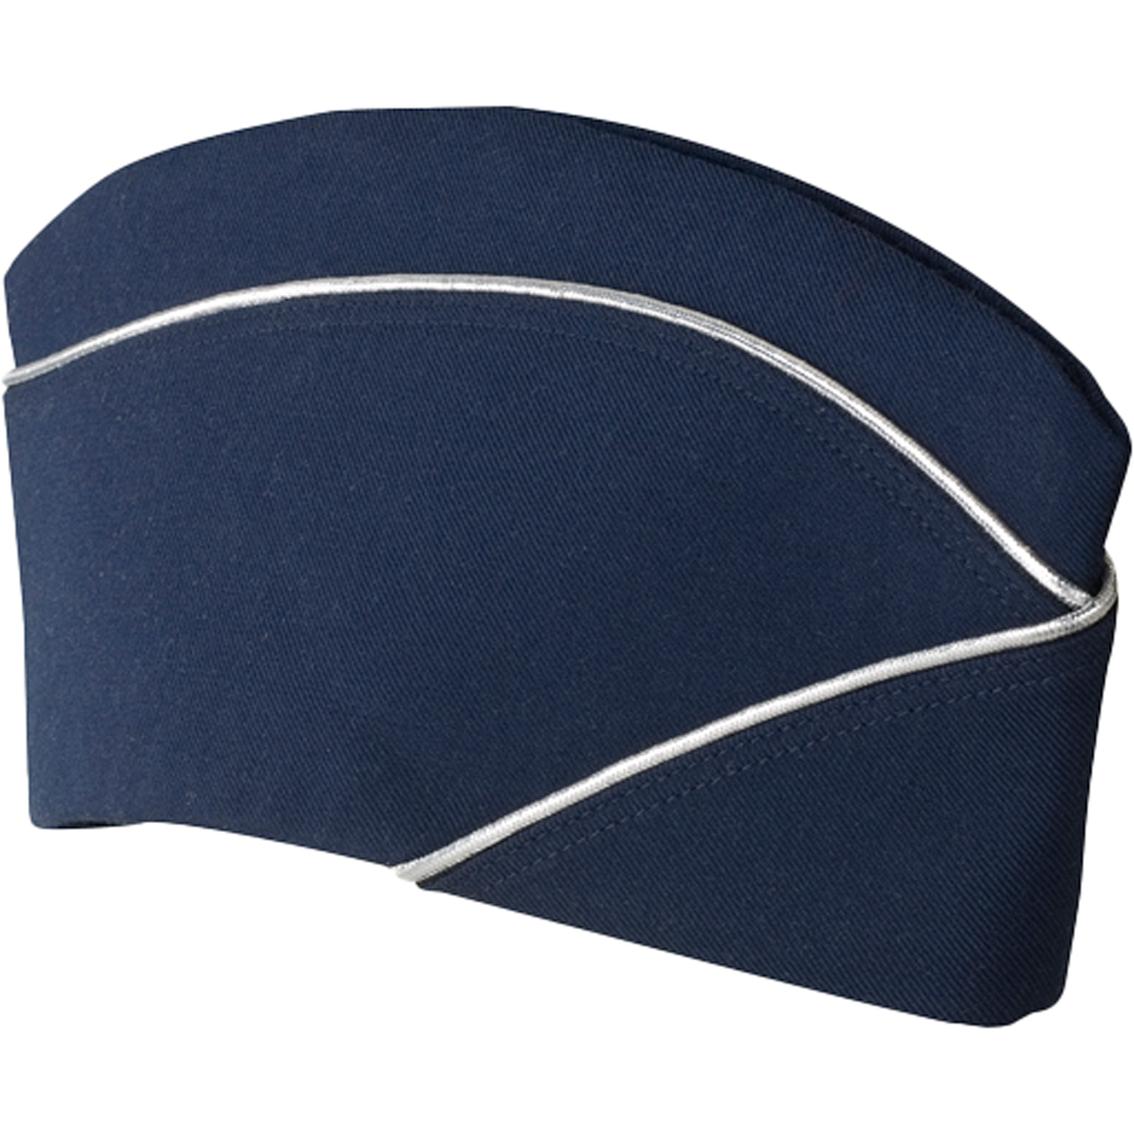 Air Force General Officer Flight Cap Headgear Military